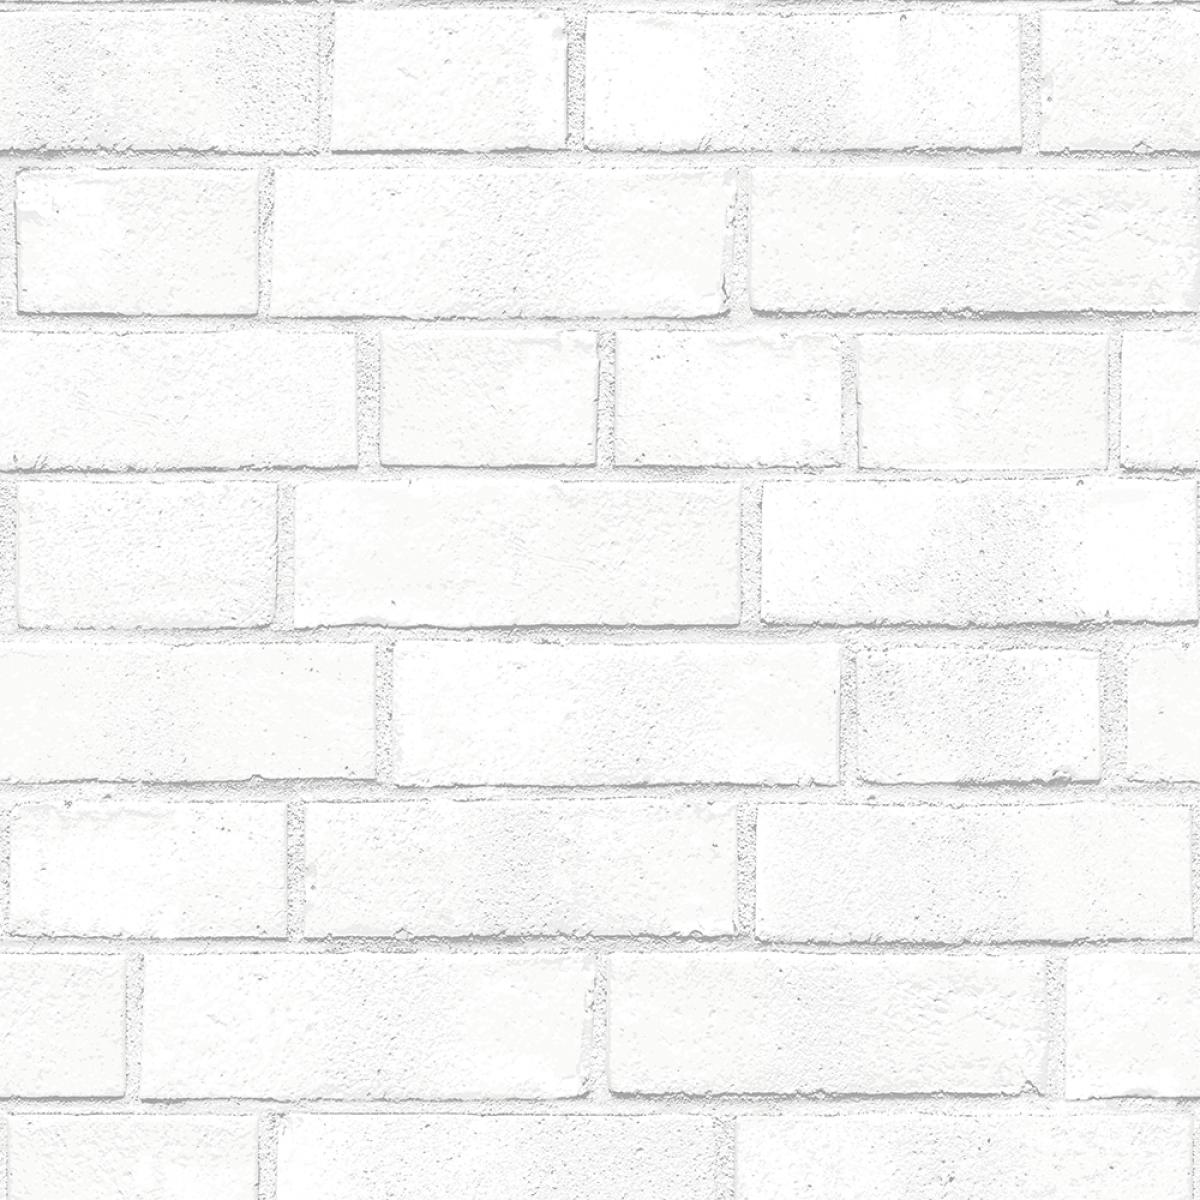 Removable wallpaper White textured wallpaper, Brick